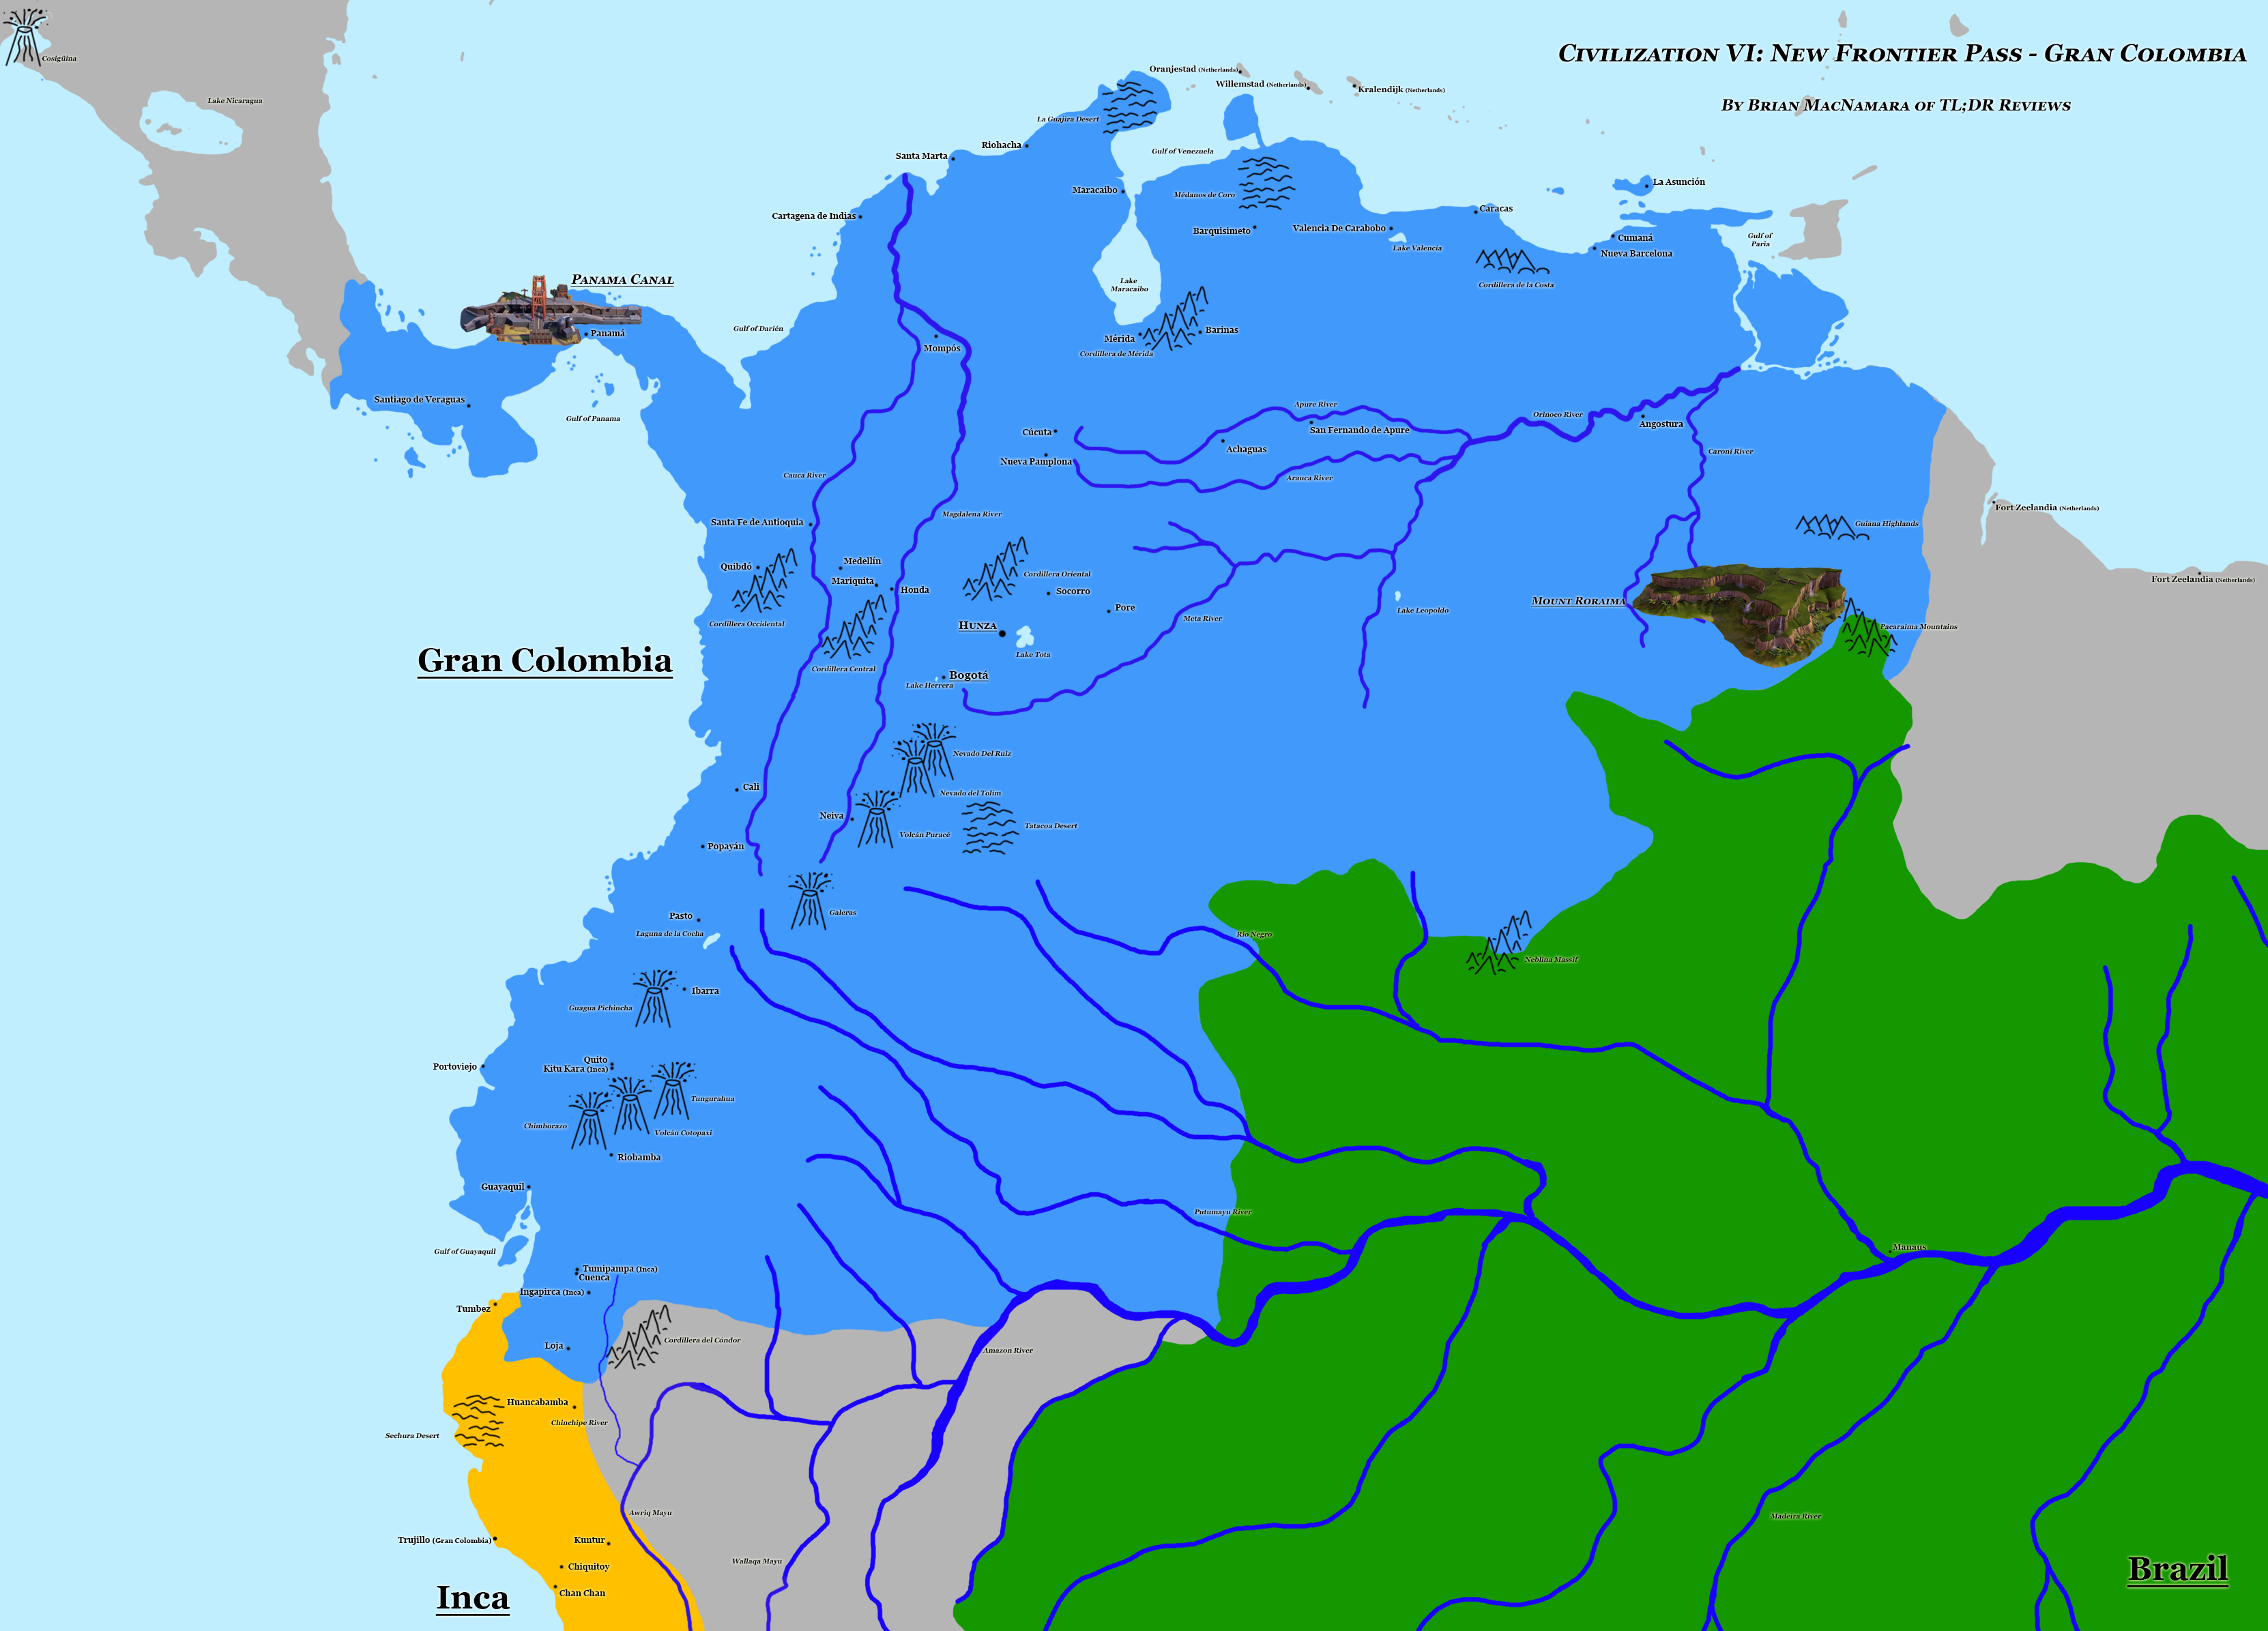 Map of Gran Colombia from Civilization VI. Image Credit: Brian MacNamara/Firaxis Games.